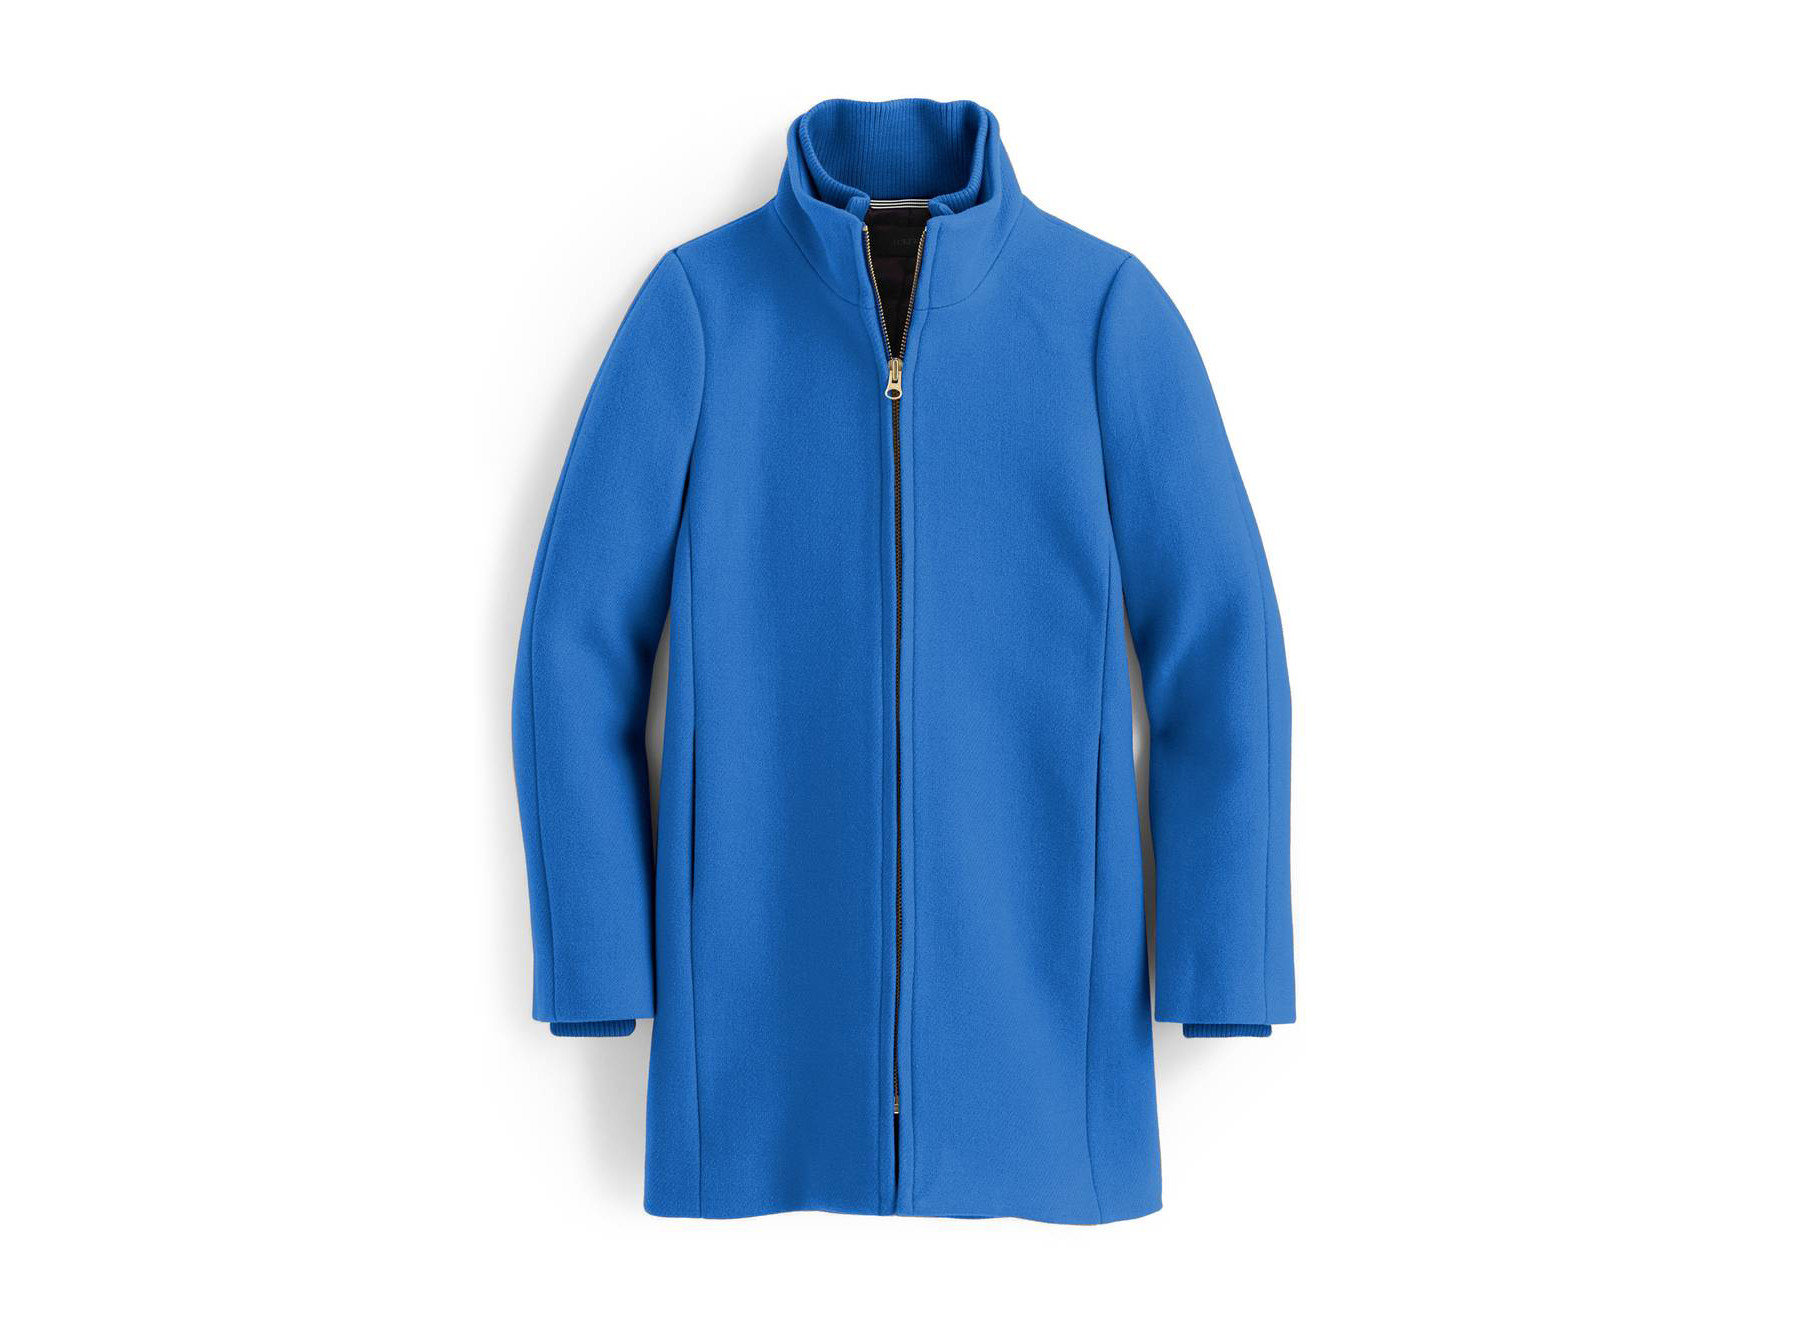 Style + Design Travel Shop blue clothing cobalt blue electric blue person wearing hood sweatshirt polar fleece outerwear sleeve jacket active shirt neck product coat colored